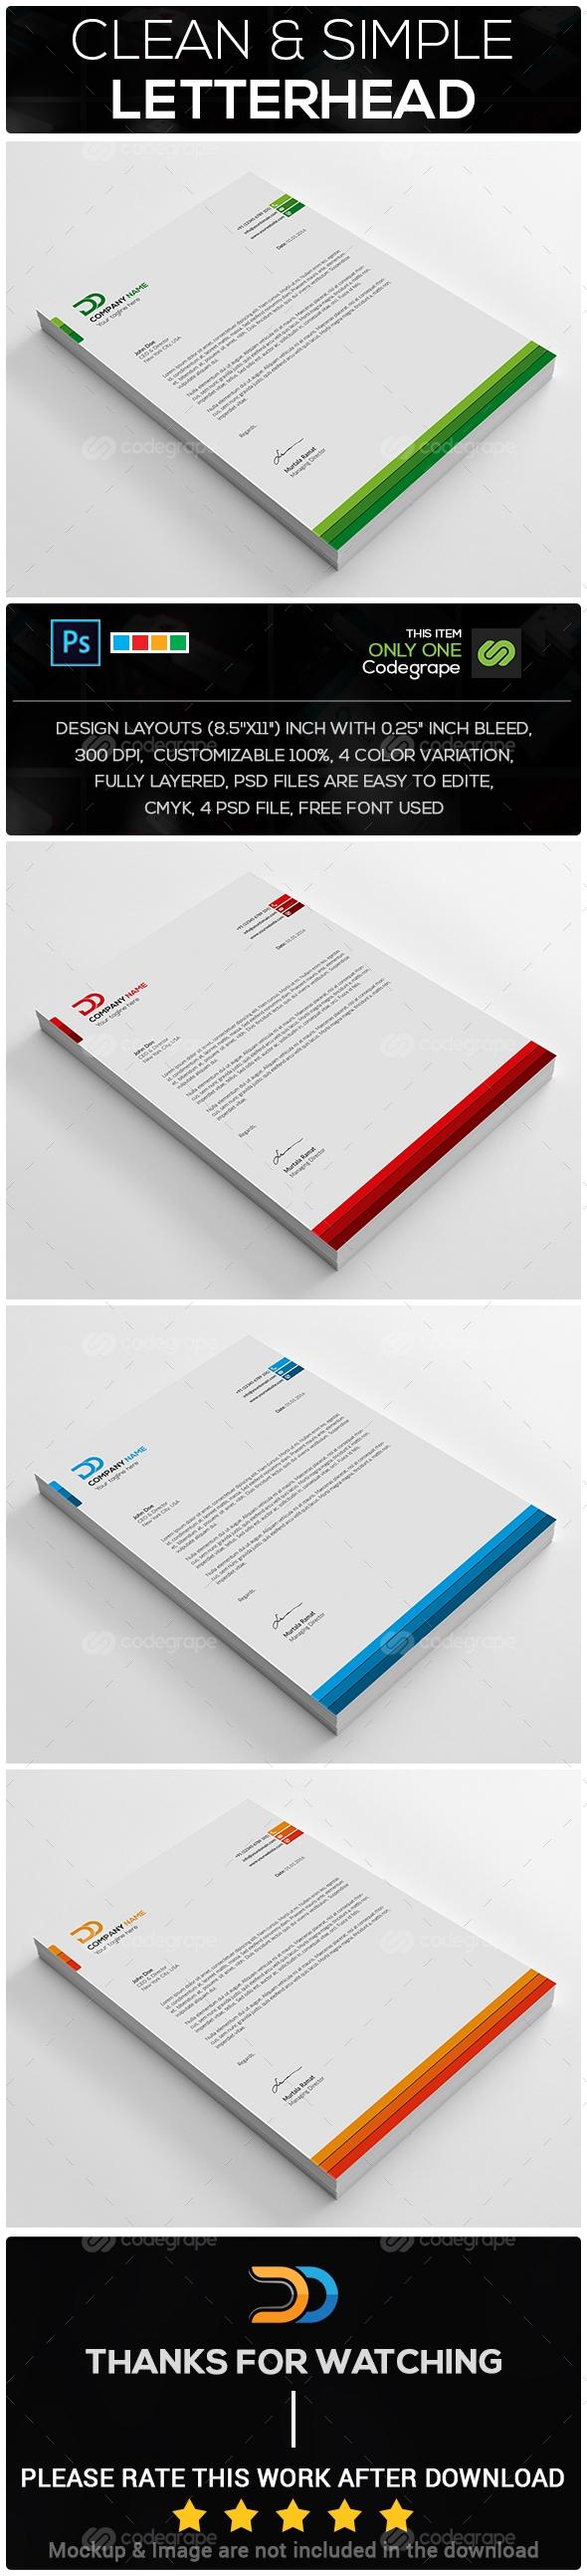 Clean & Simple Letterhead